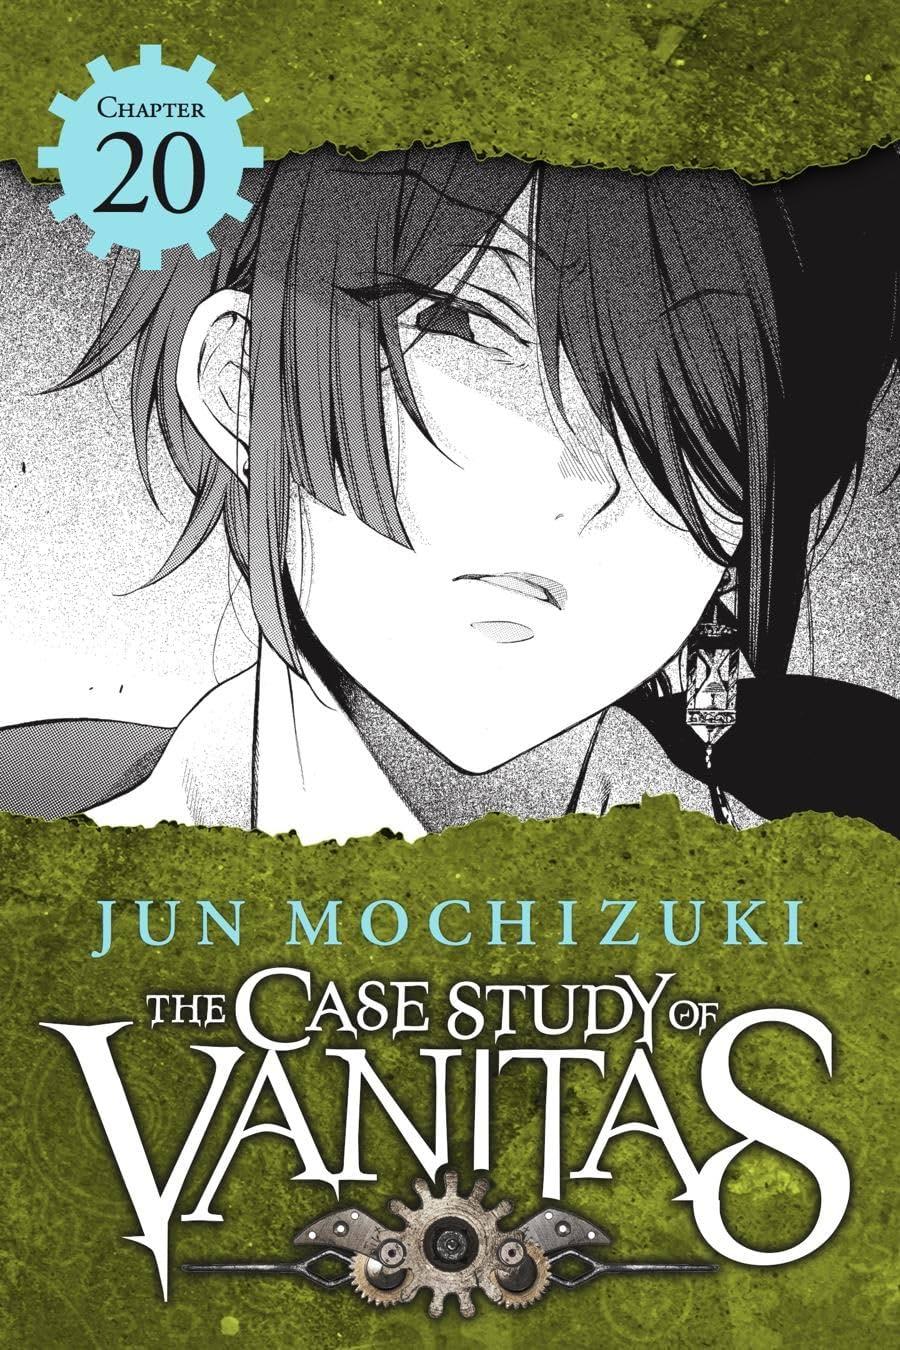 The Case Study of Vanitas #20